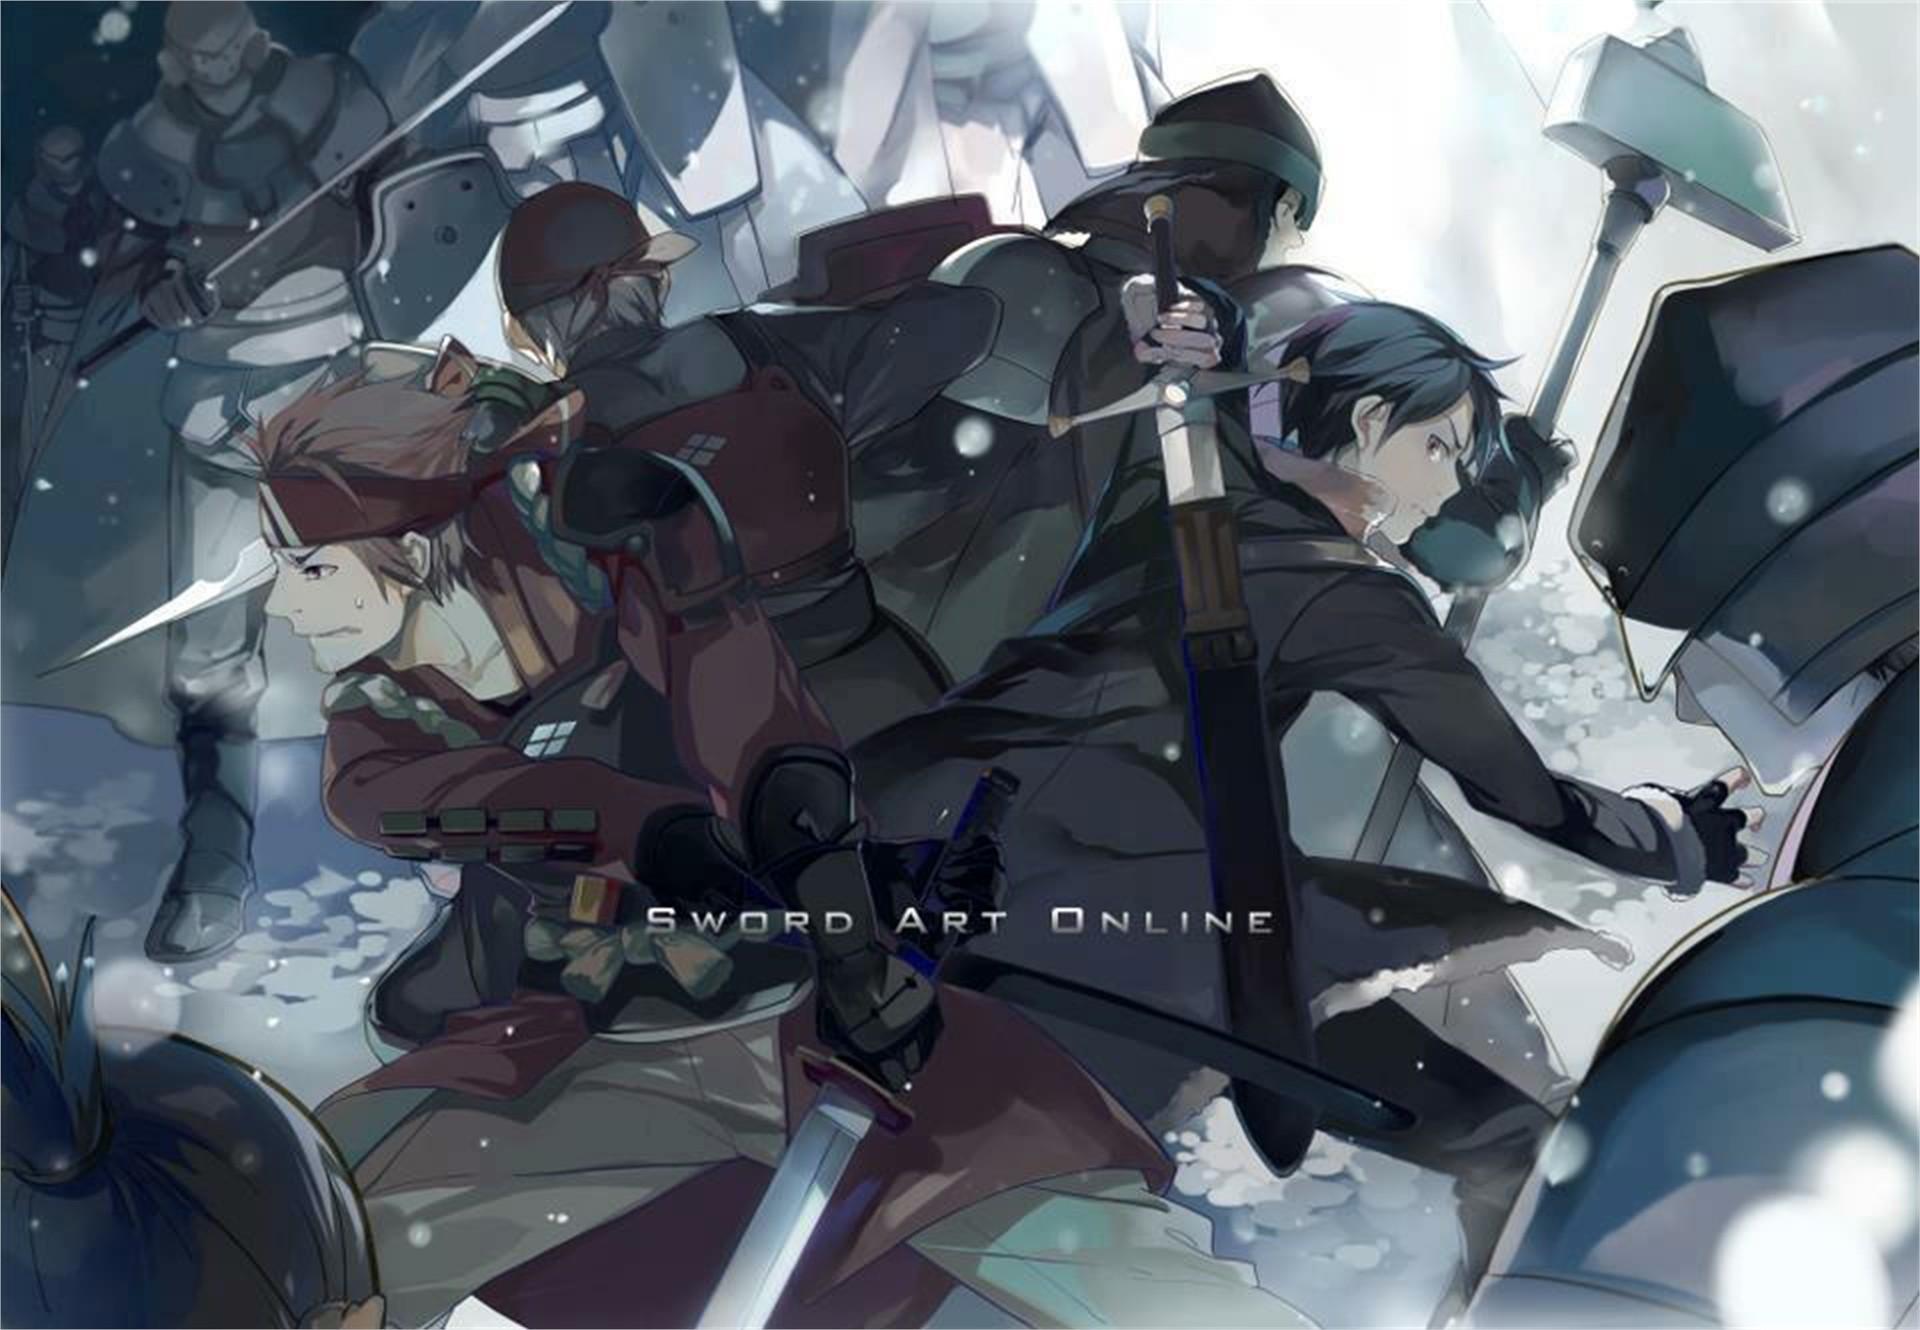 Anime – Sword Art Online Klein (Sword Art Online) Kirito (Sword Art Online